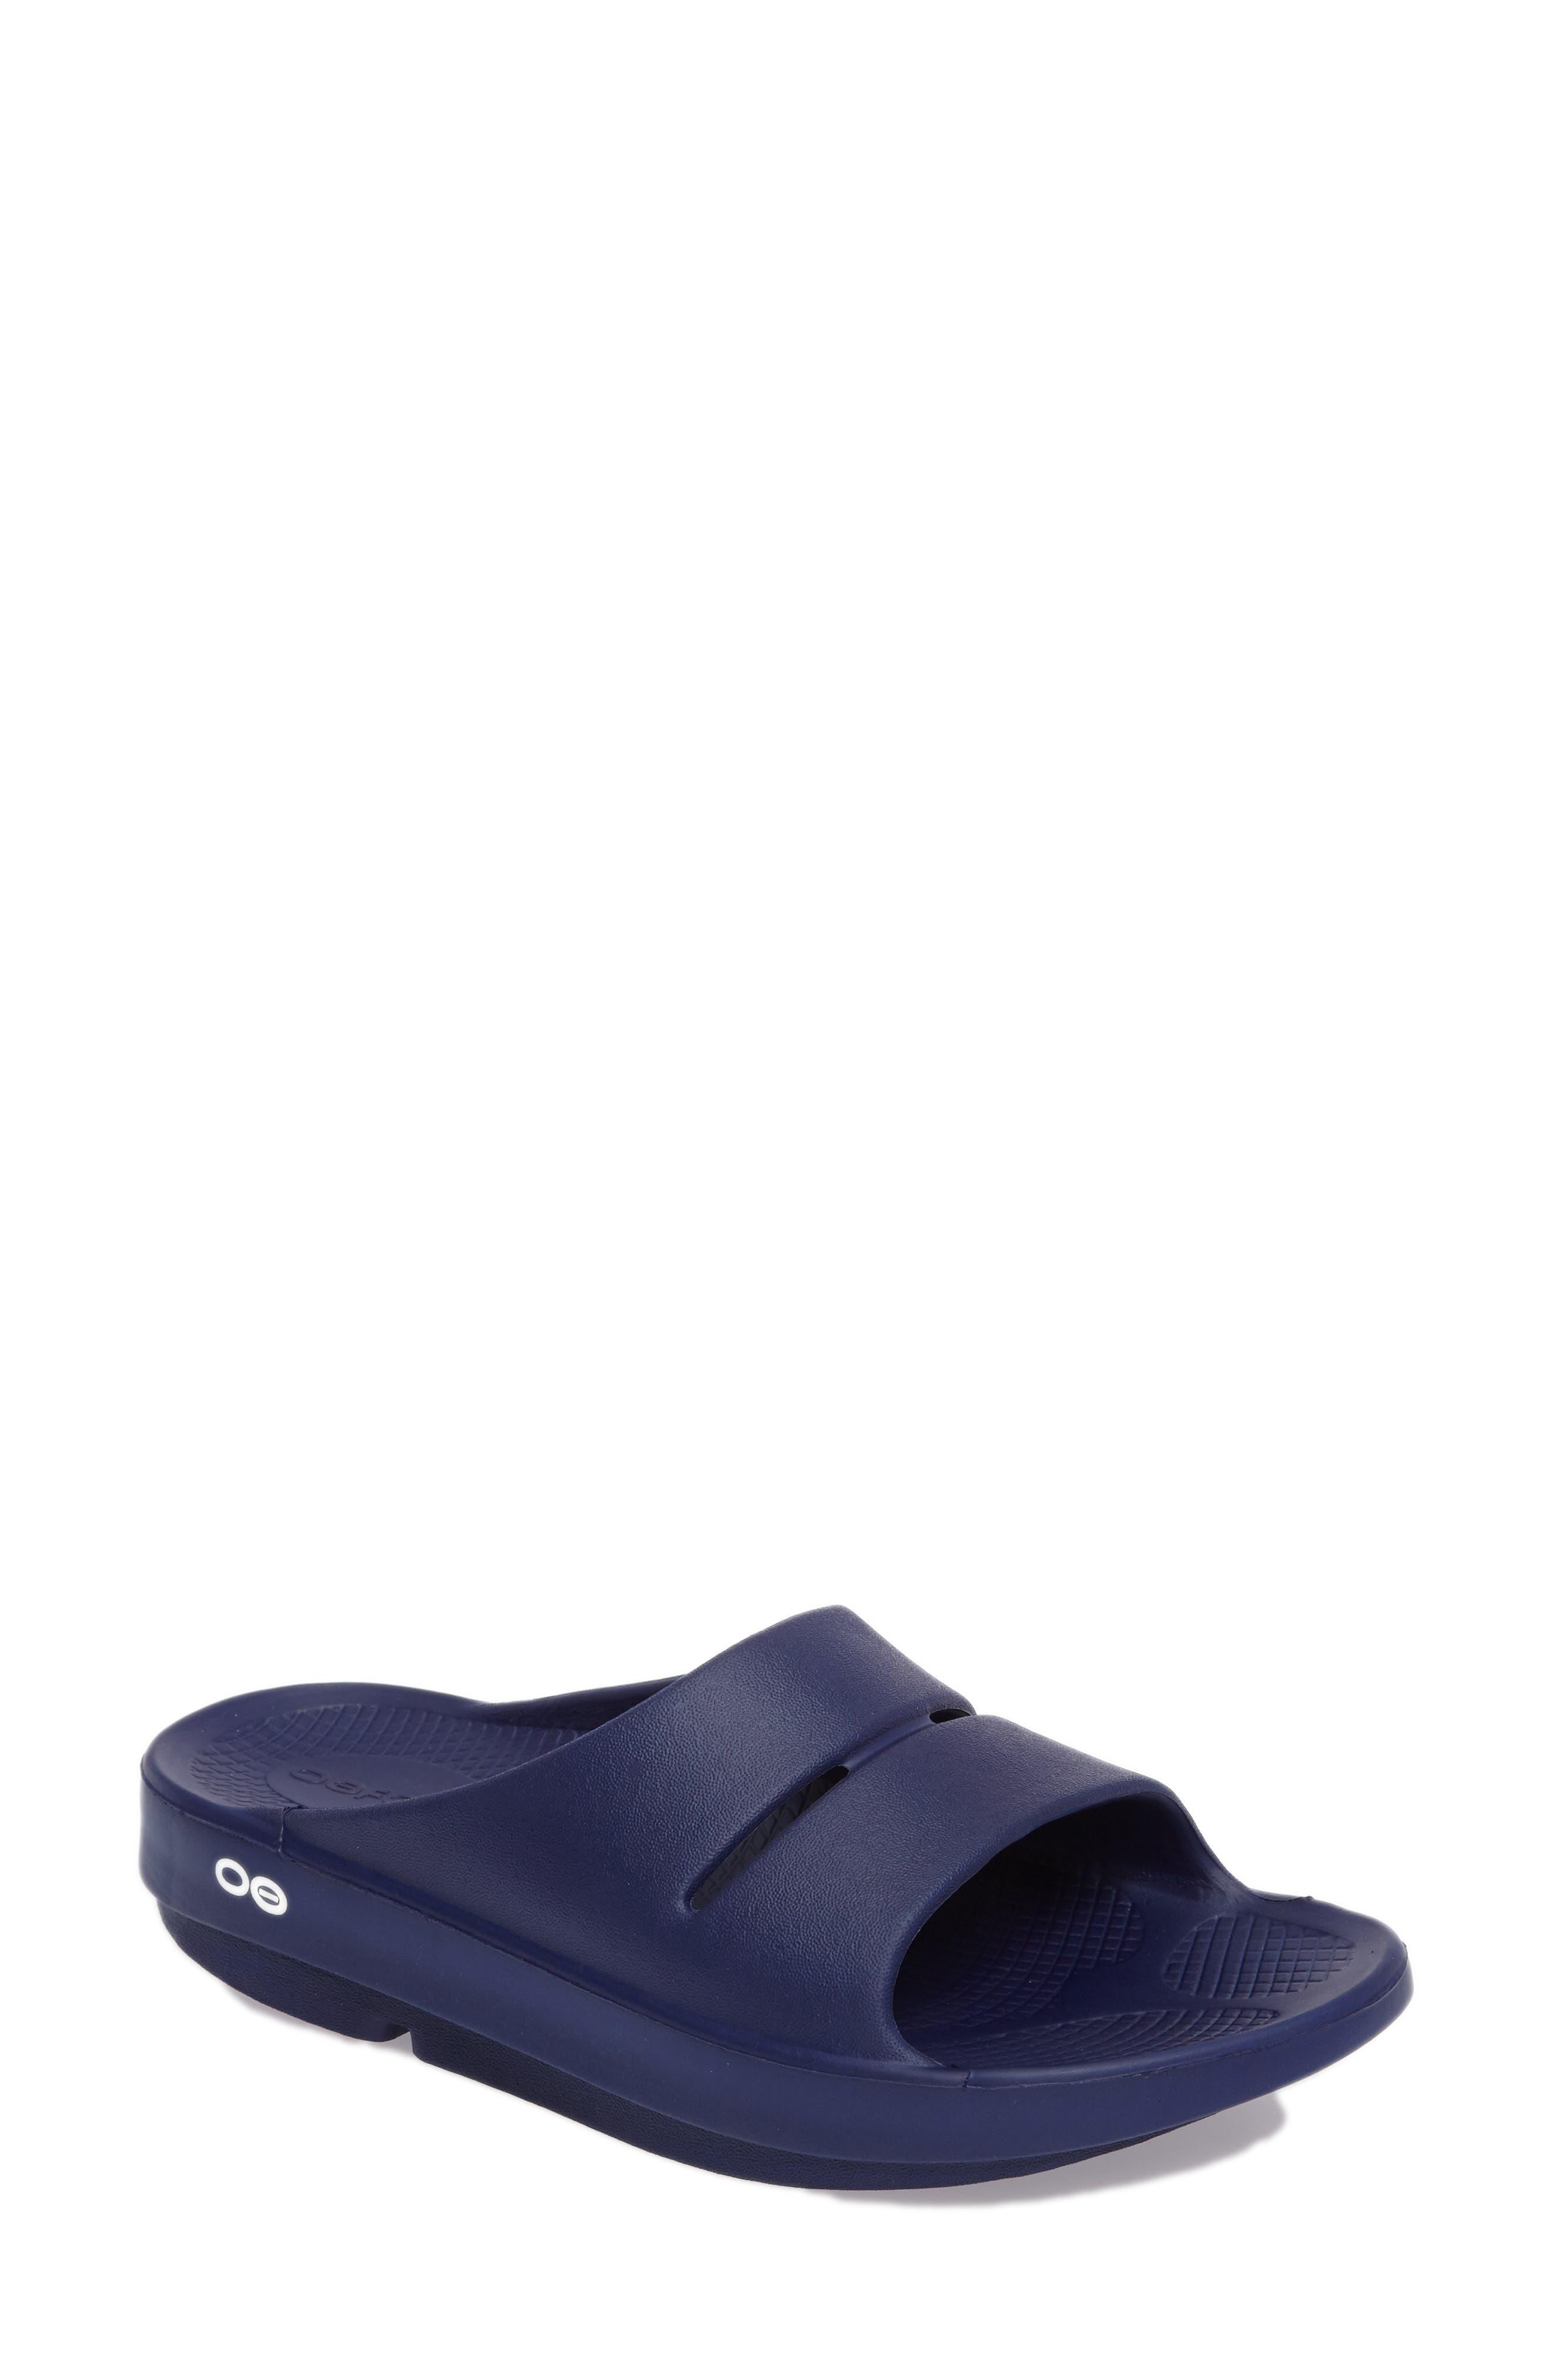 Main Image - Oofos OOahh Slide Sandal (Women)